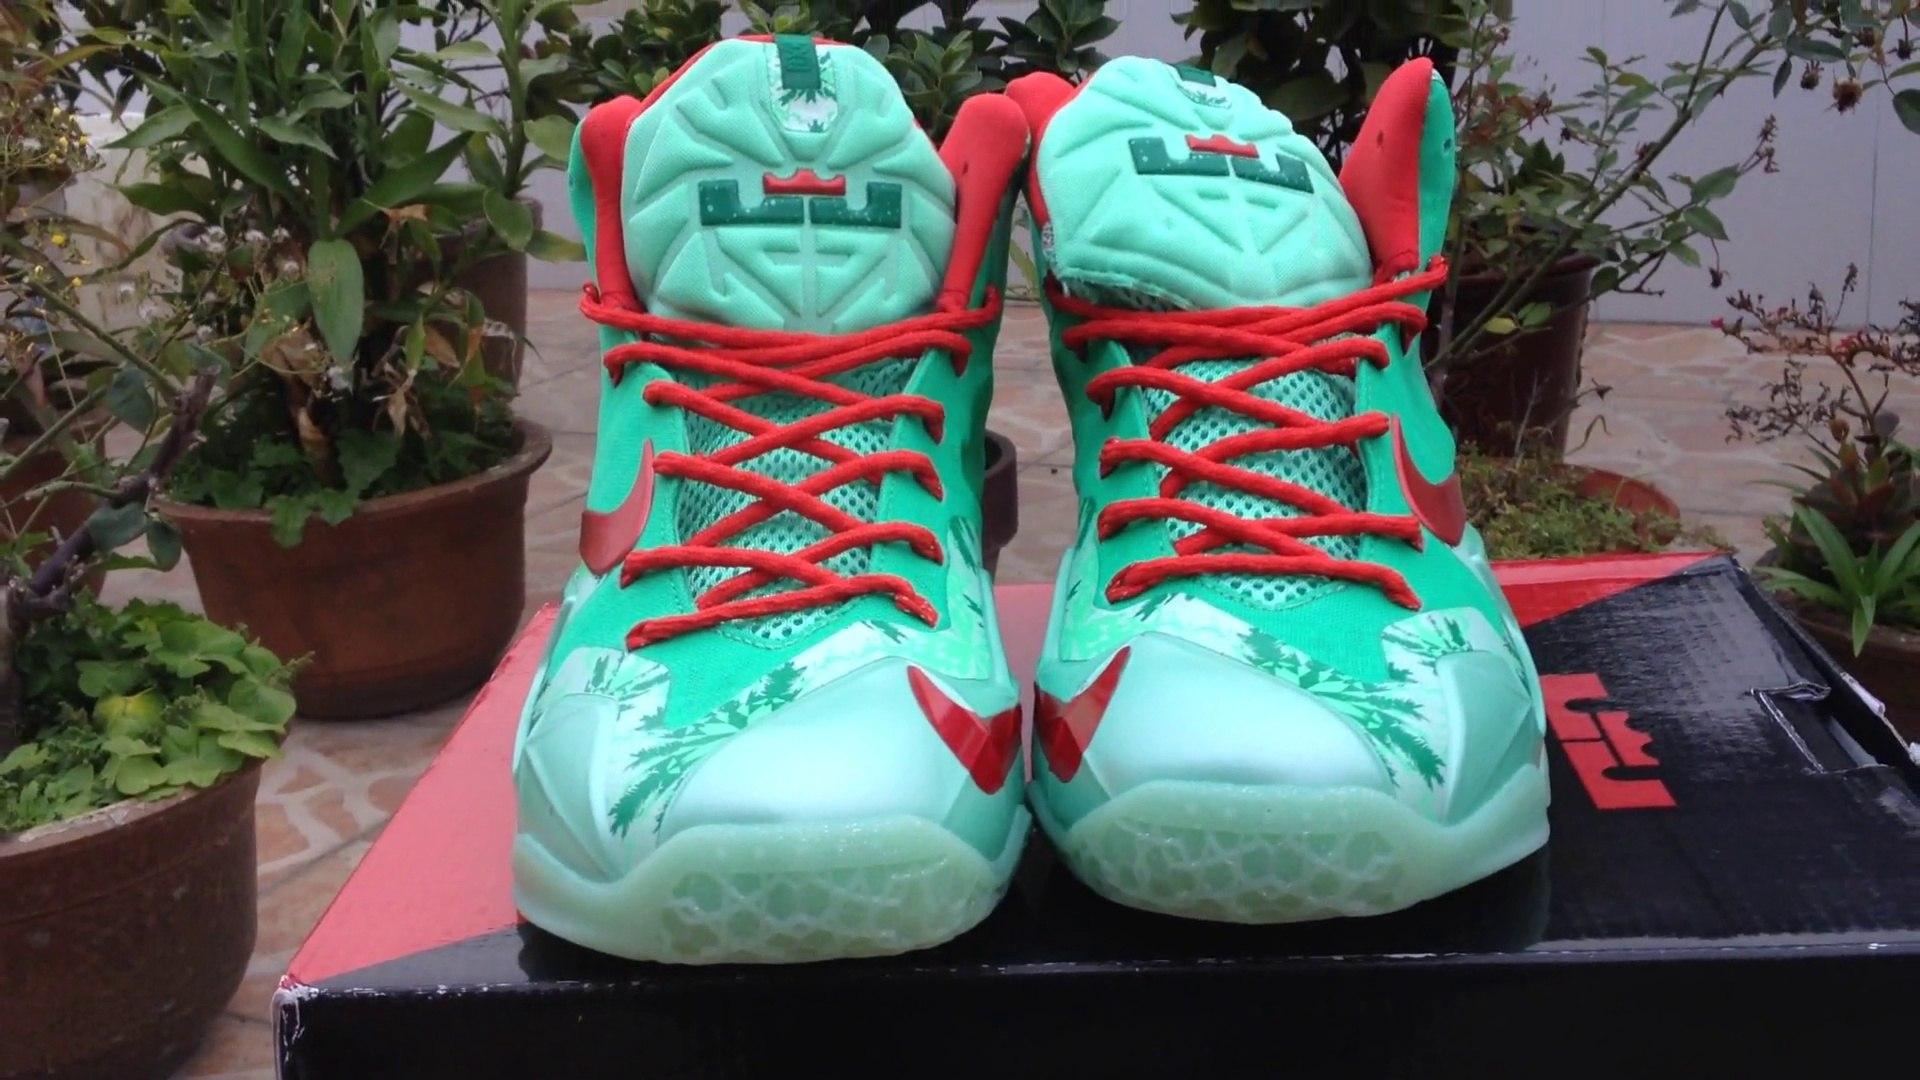 Cheap Lebron Shoes-Nike Lebron 11 Red Green Basketball Shoe Review Shopmallcn.ru